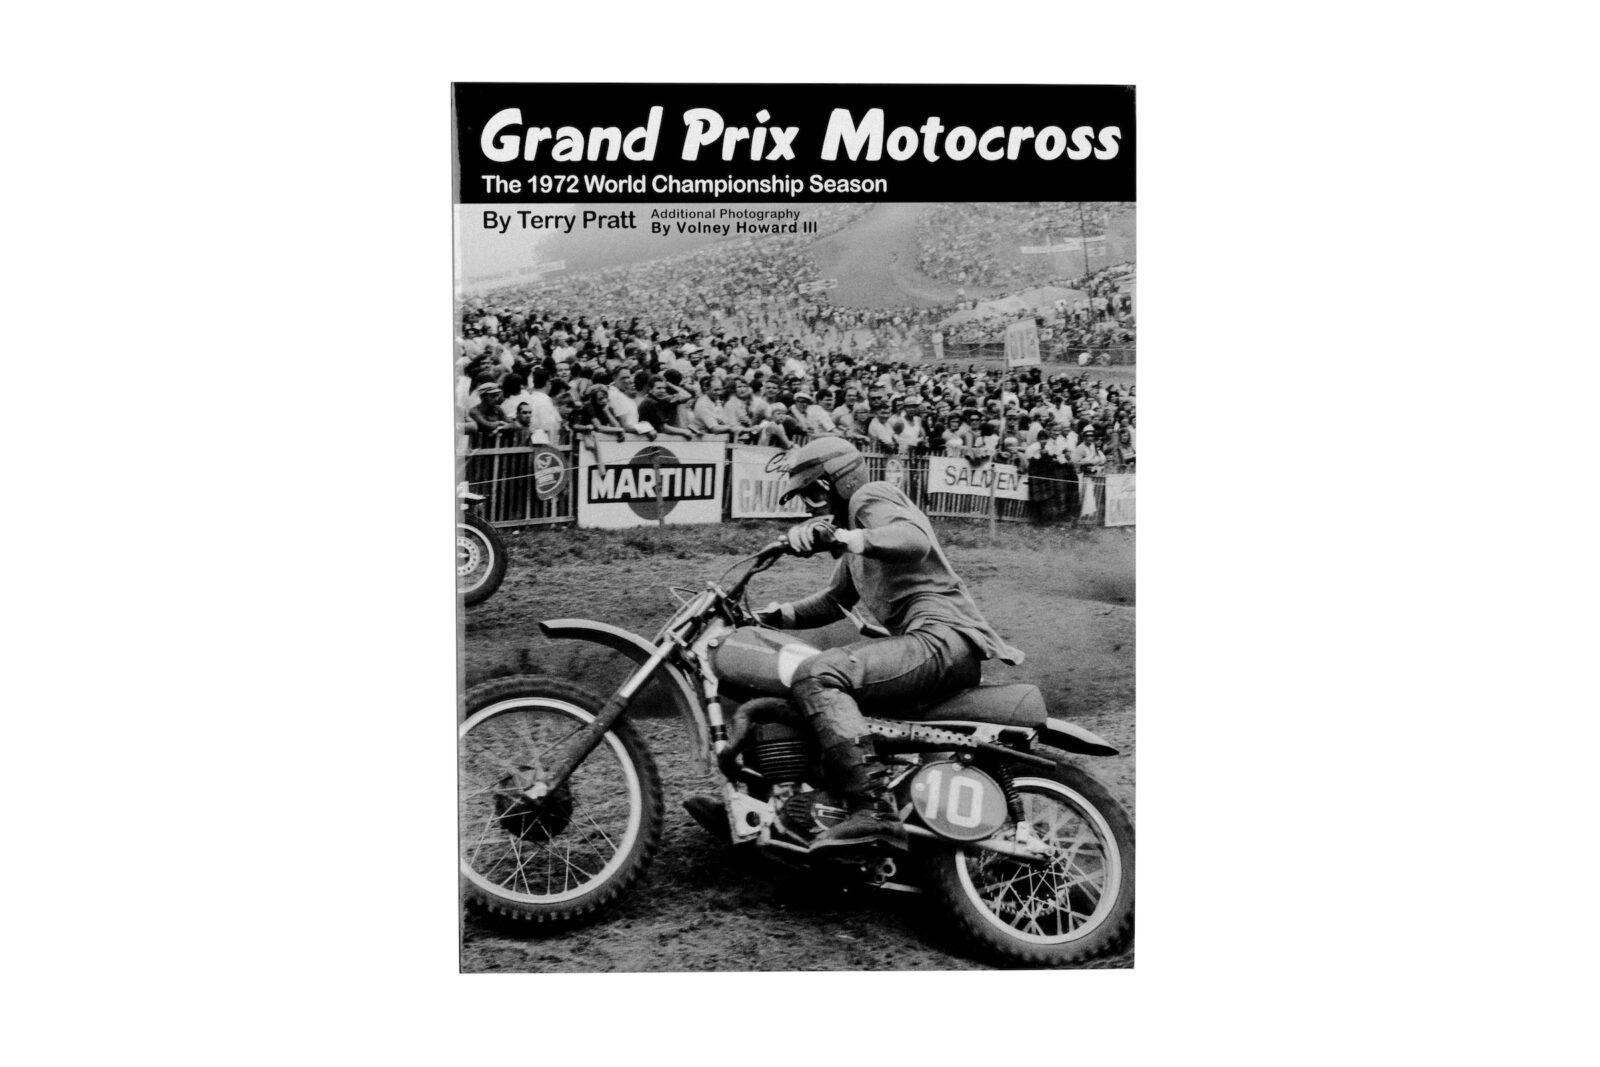 Grand Prix Motocross Book The 1972 Season